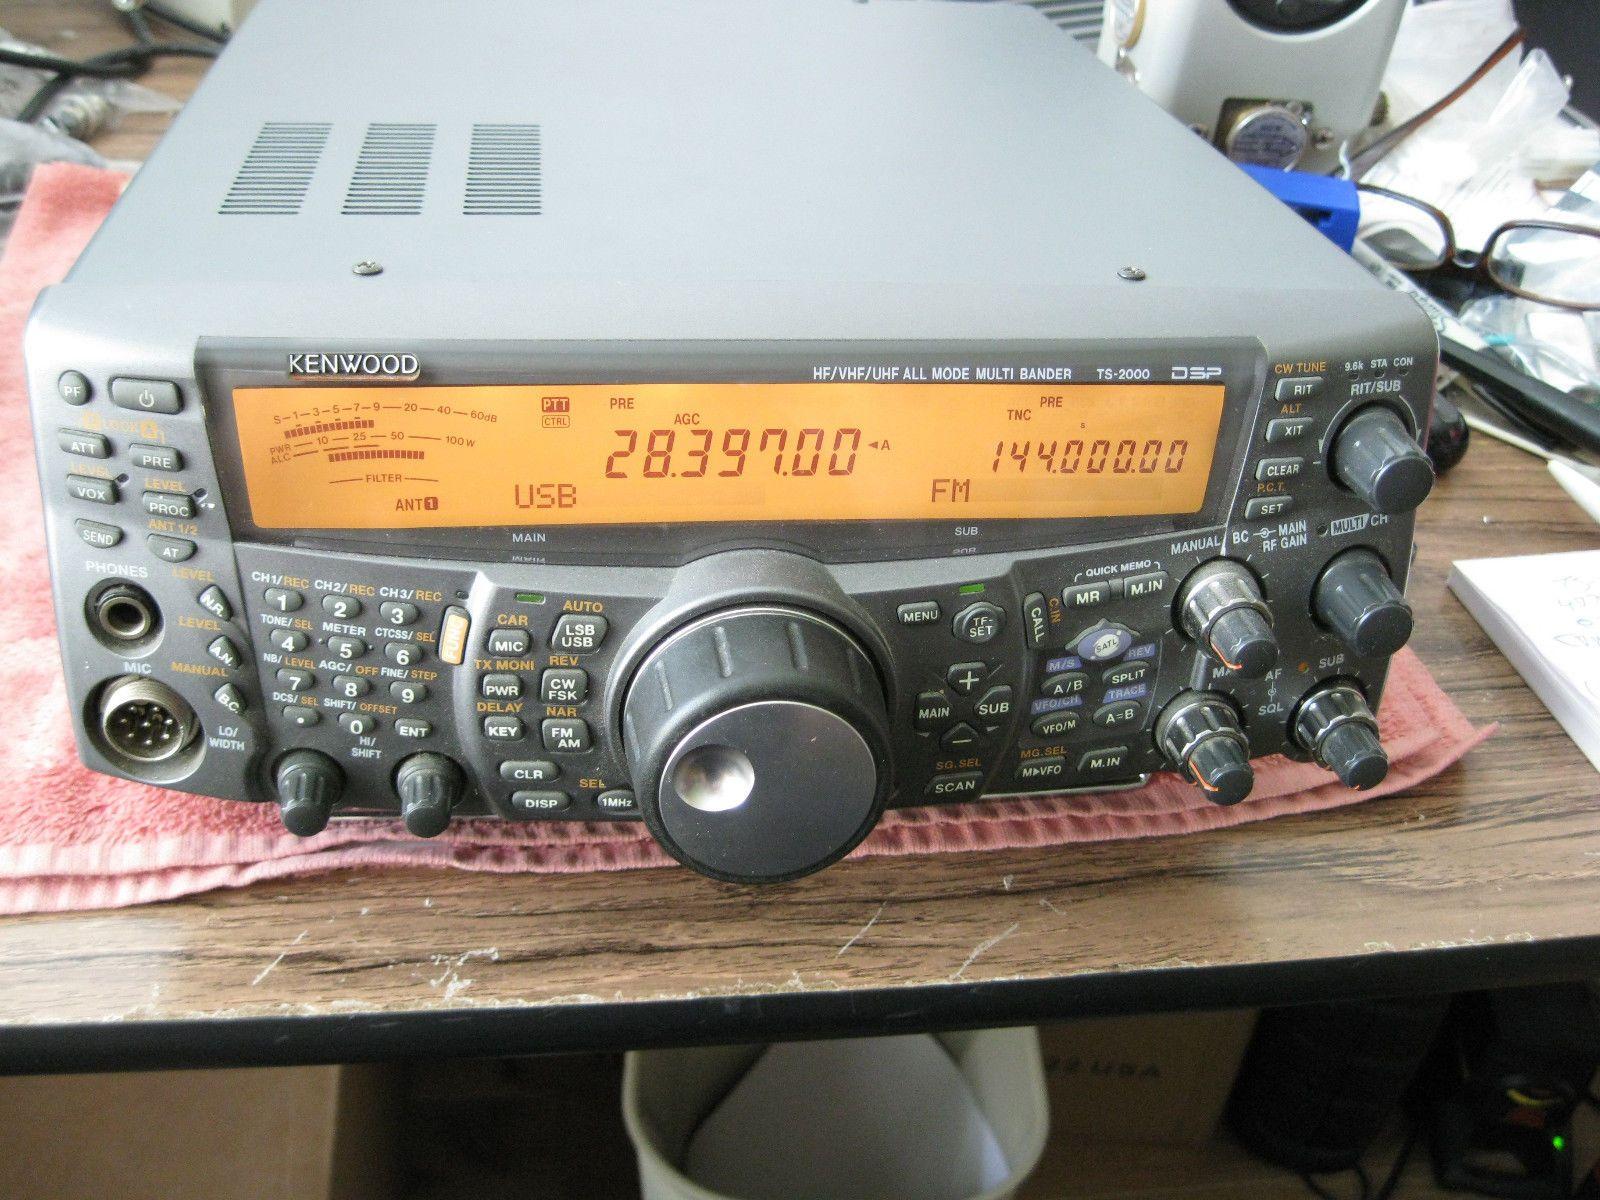 Kenwood Ts 2000 Hf Vhf Uhf Sat Transceiver In Excellent Shape Ham Radio Ham Radio Equipment Kenwood